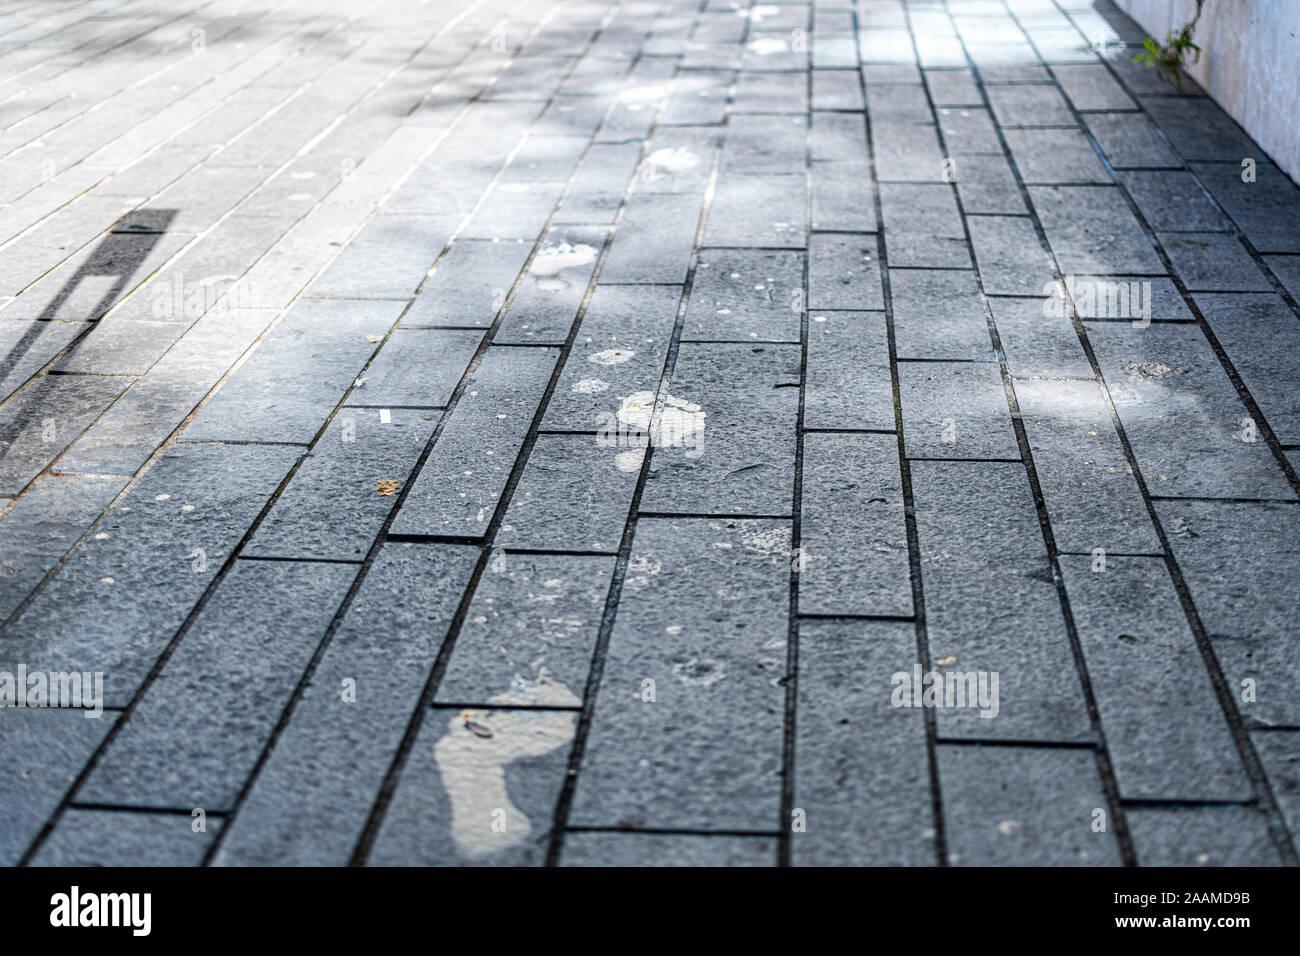 Wet footprints on concrete tiles. Stock Photo